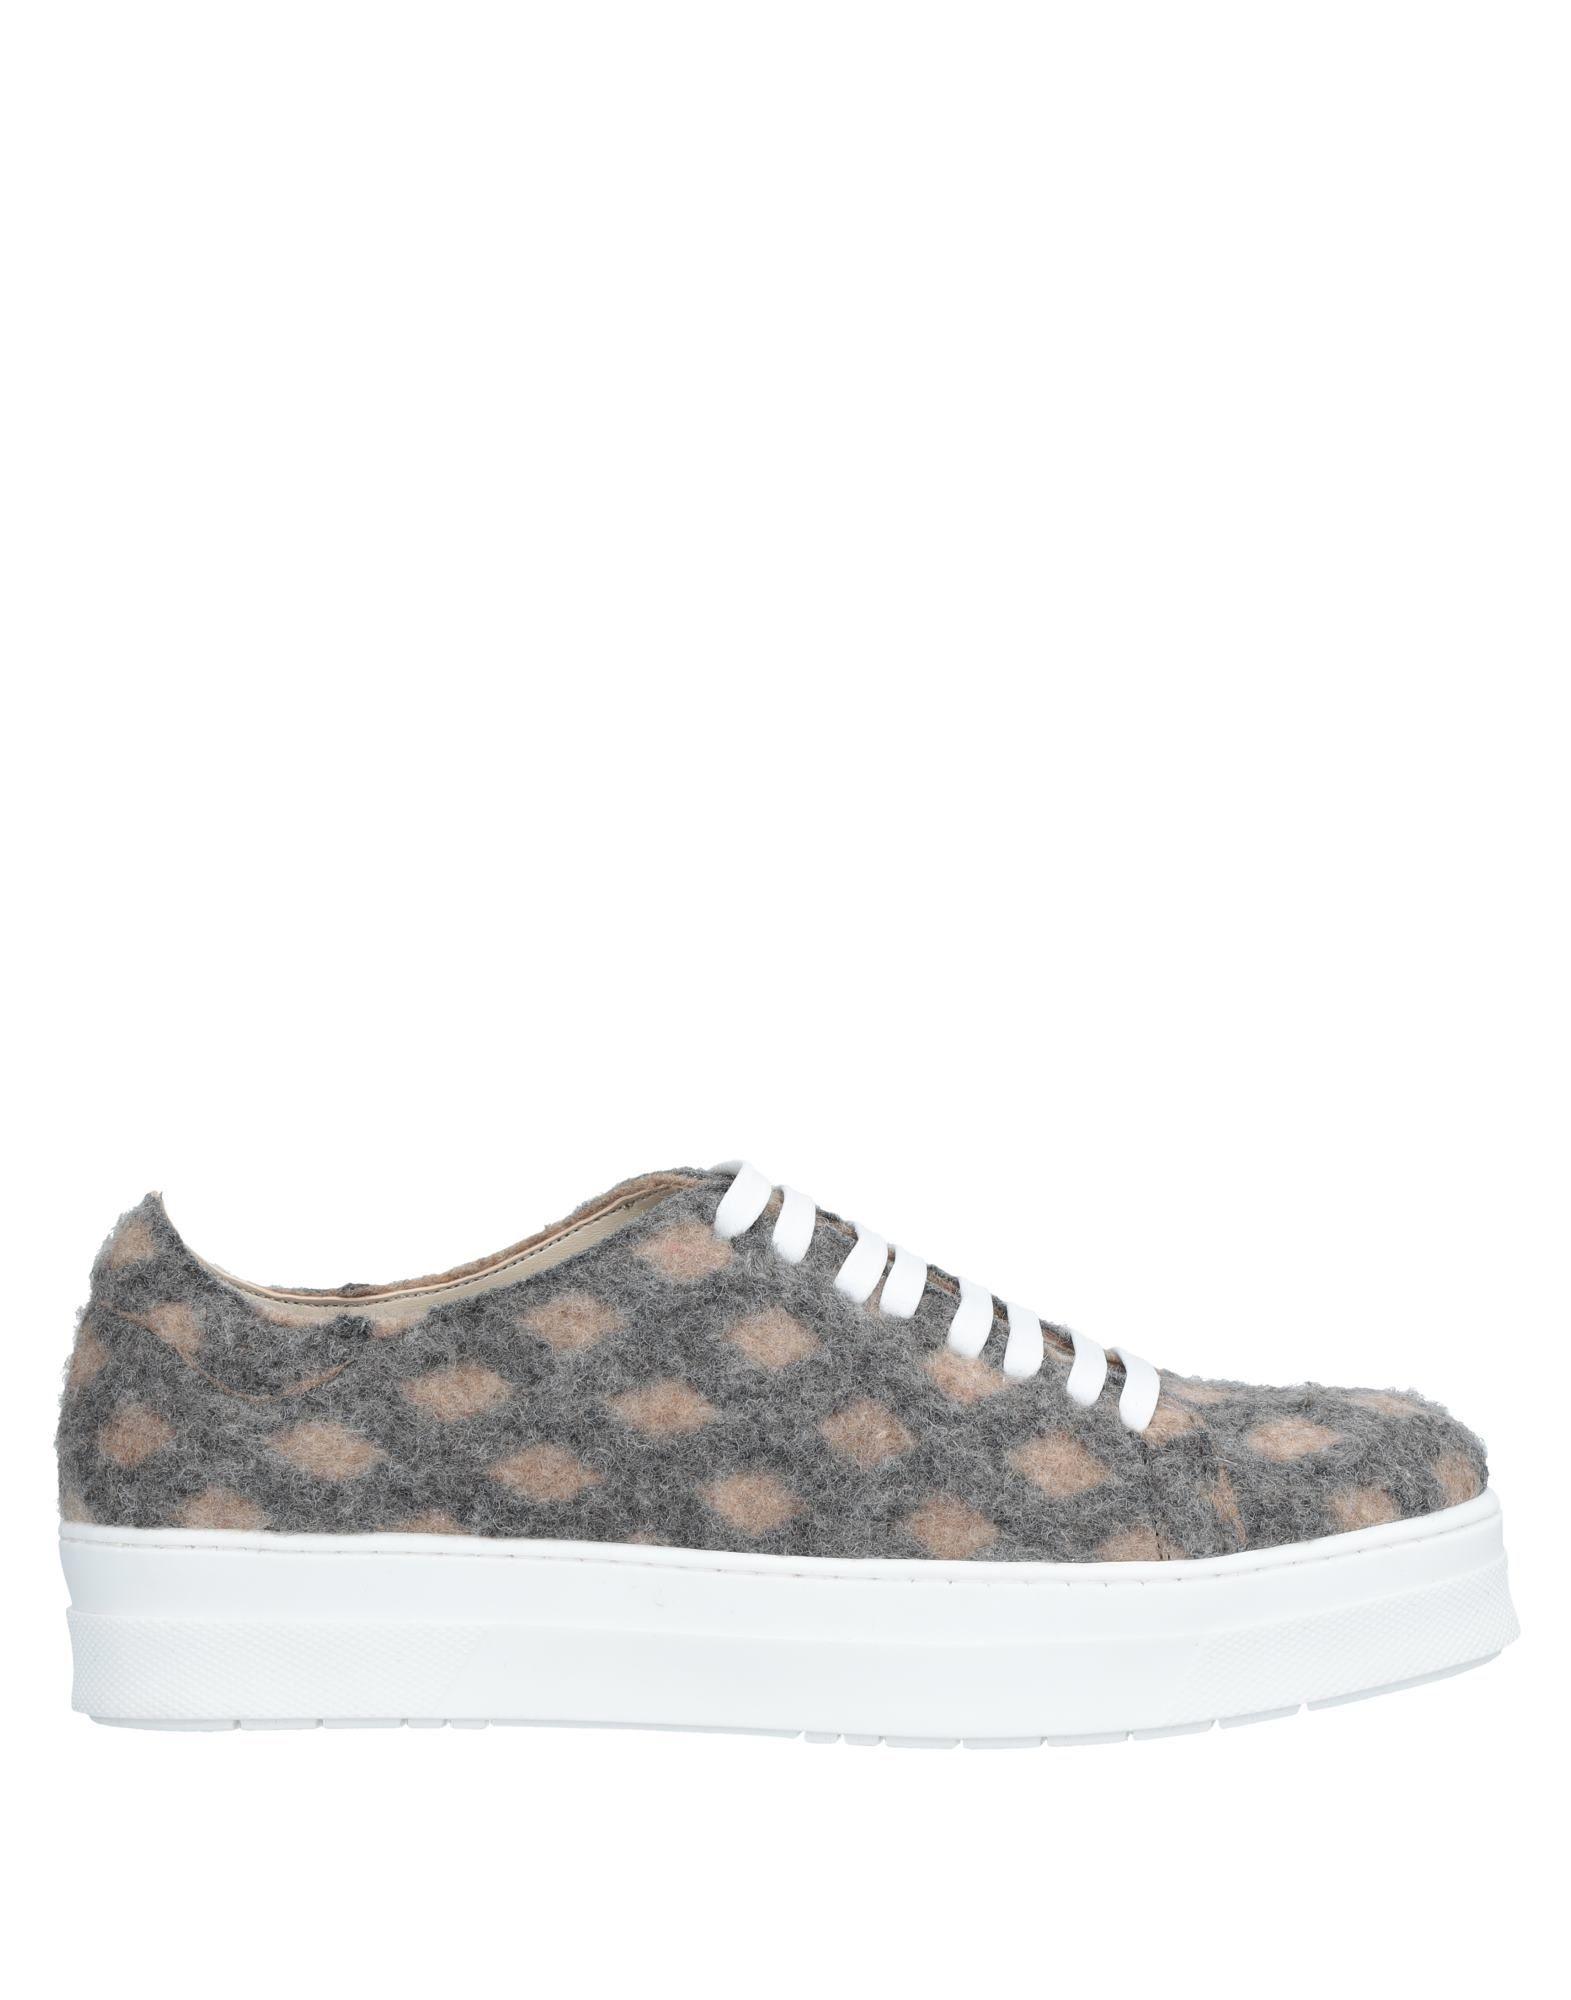 Islo Isabella Lorusso Sneakers Damen  11539286JB Gute Qualität beliebte Schuhe